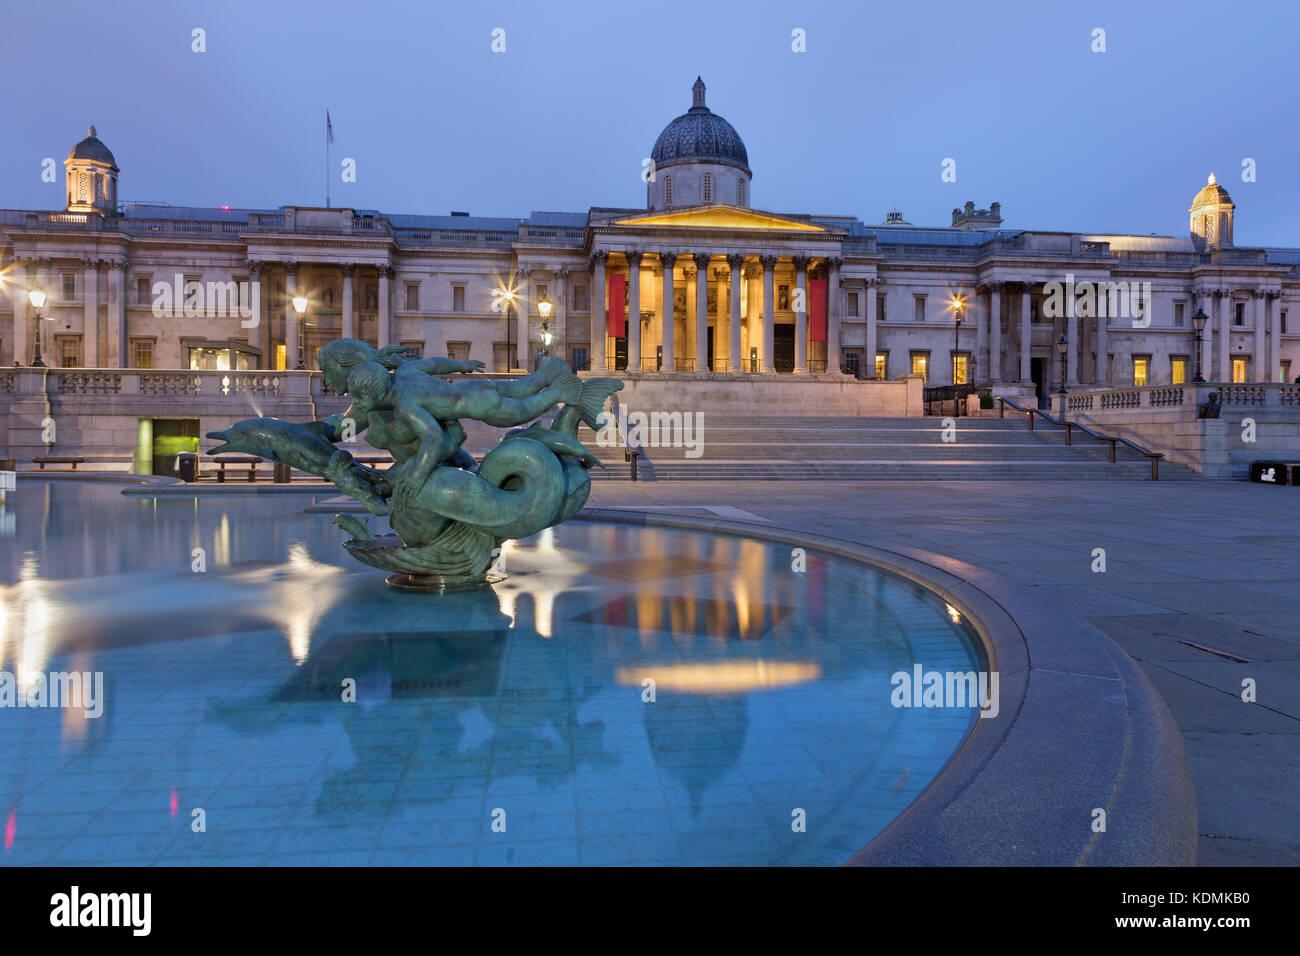 LONDON, GREAT BRITAIN - SEPTEMBER 18, 2017: The fountain of Trafalgar square at dusk. Stock Photo